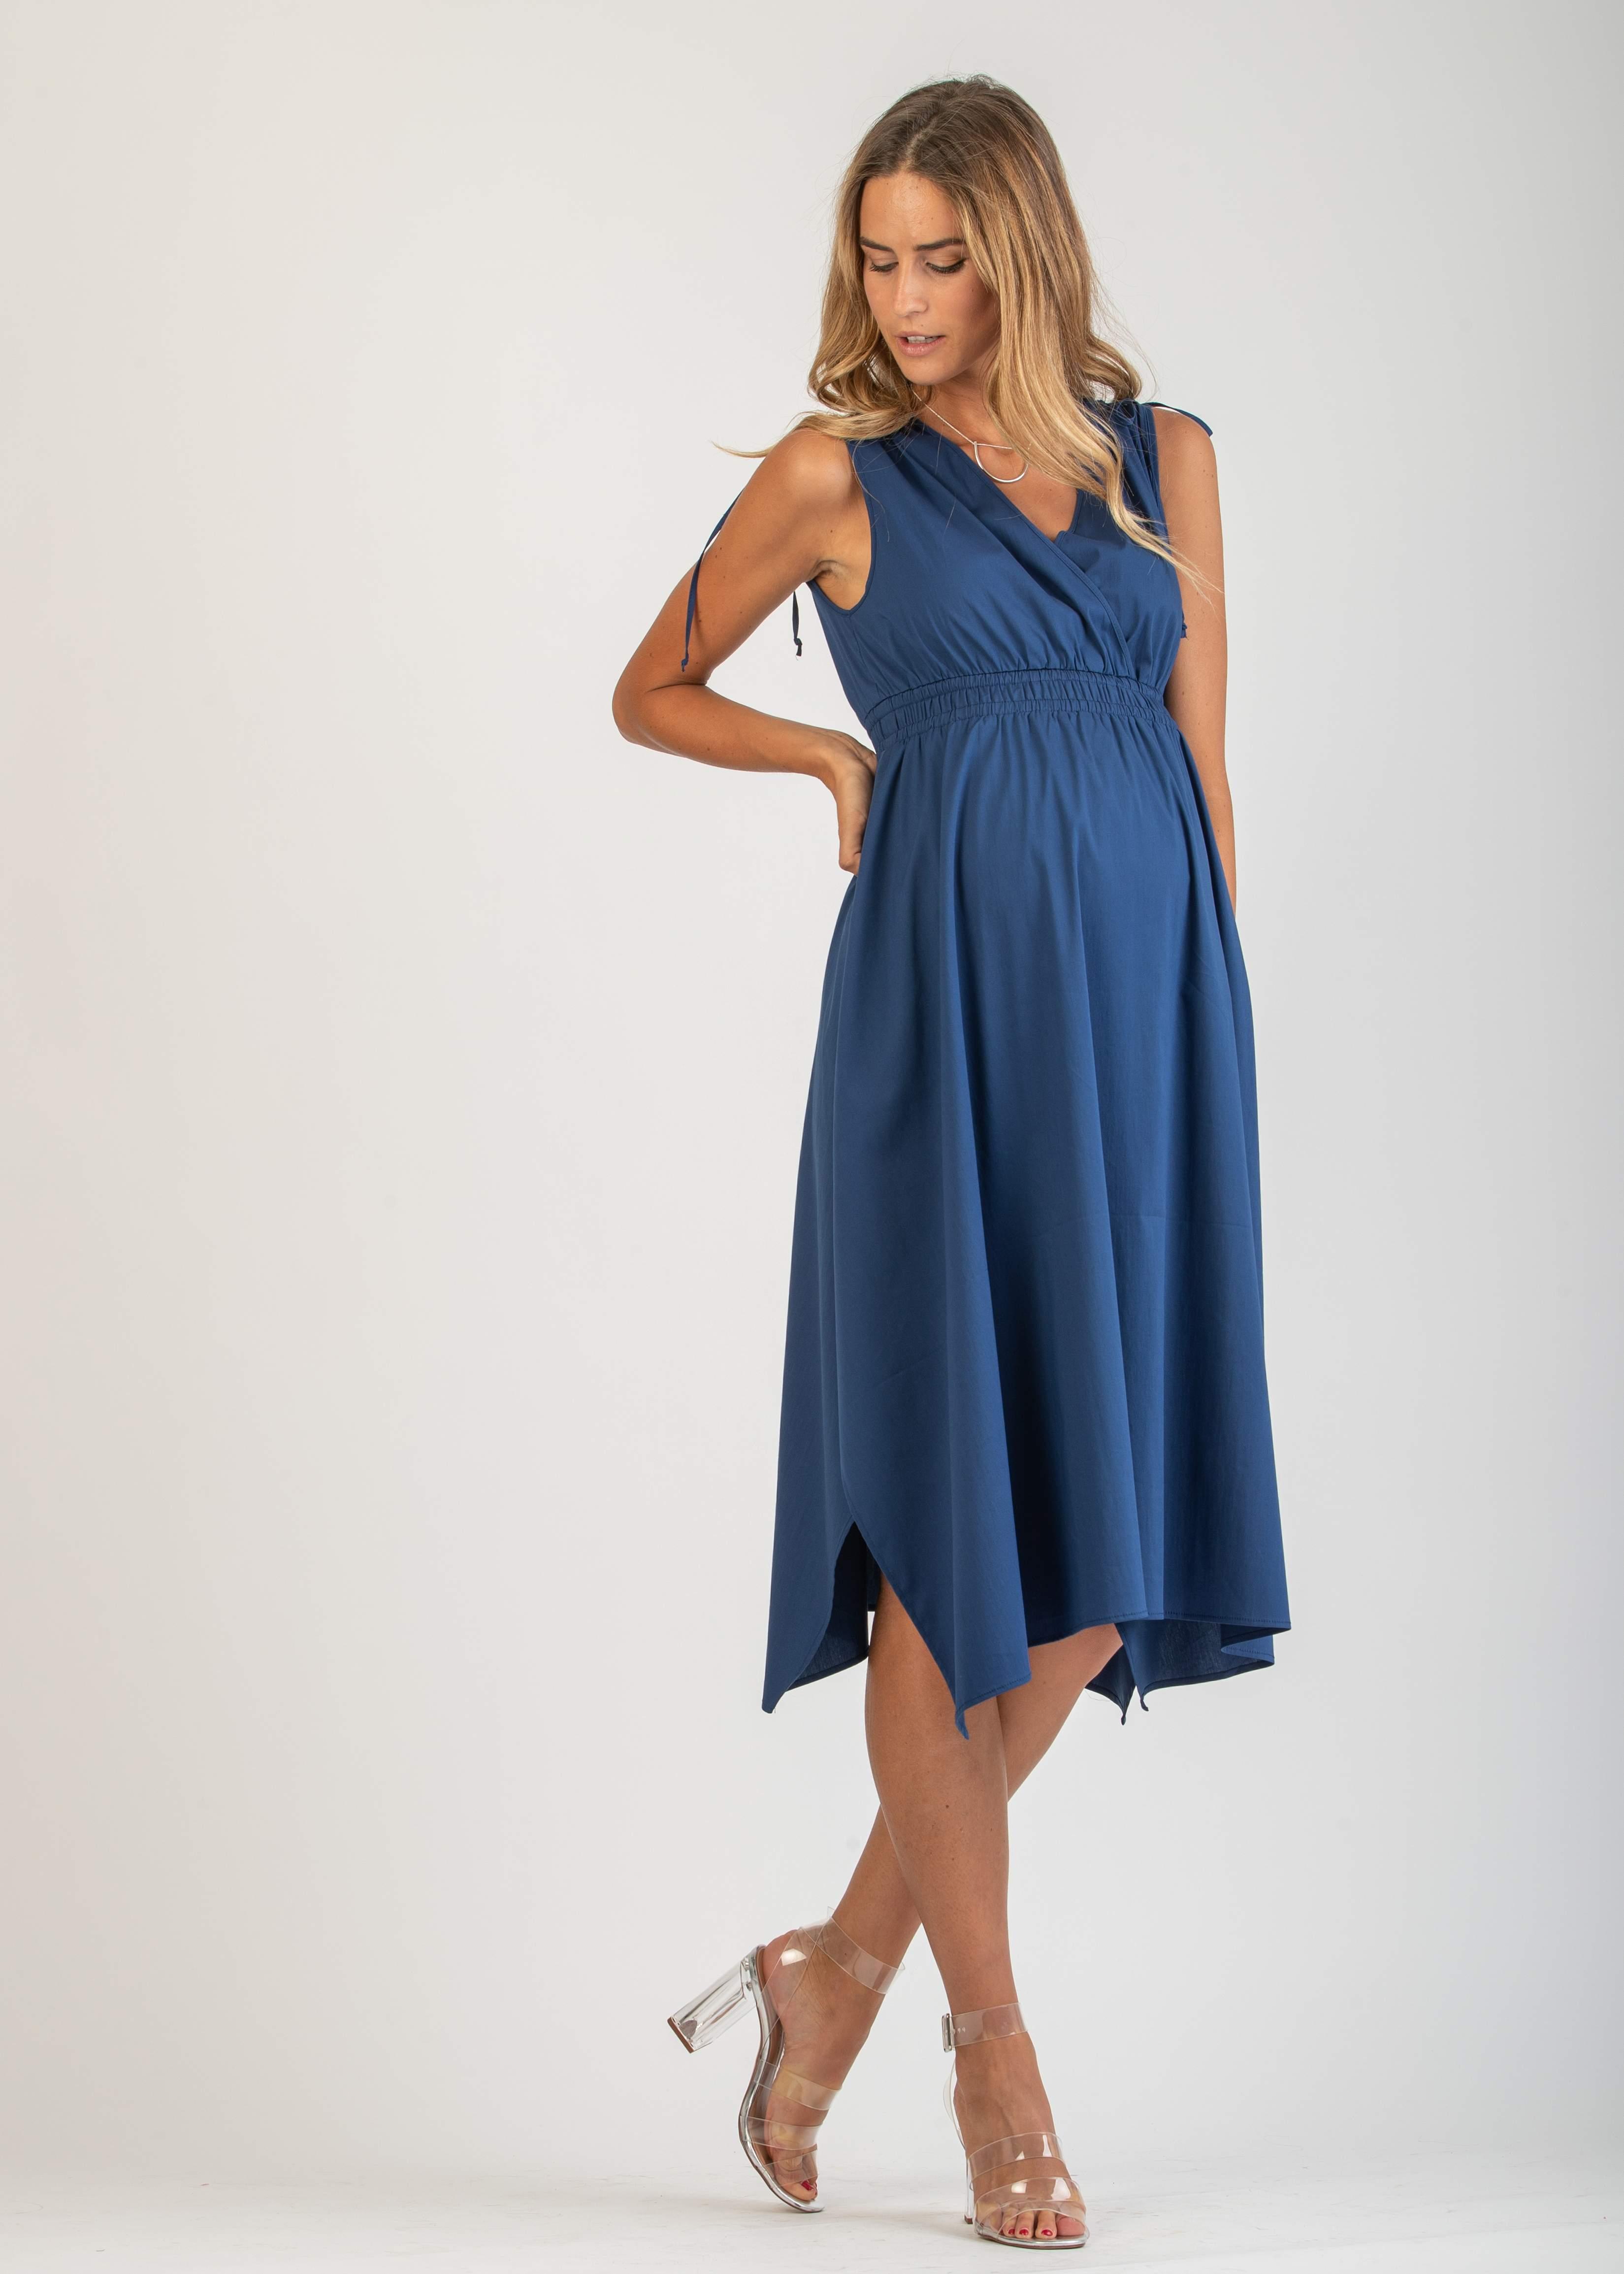 c9f79aa41ac6 Nursing - Midi Wrap Maternity Dress with Empire Waist Elastic Band ...